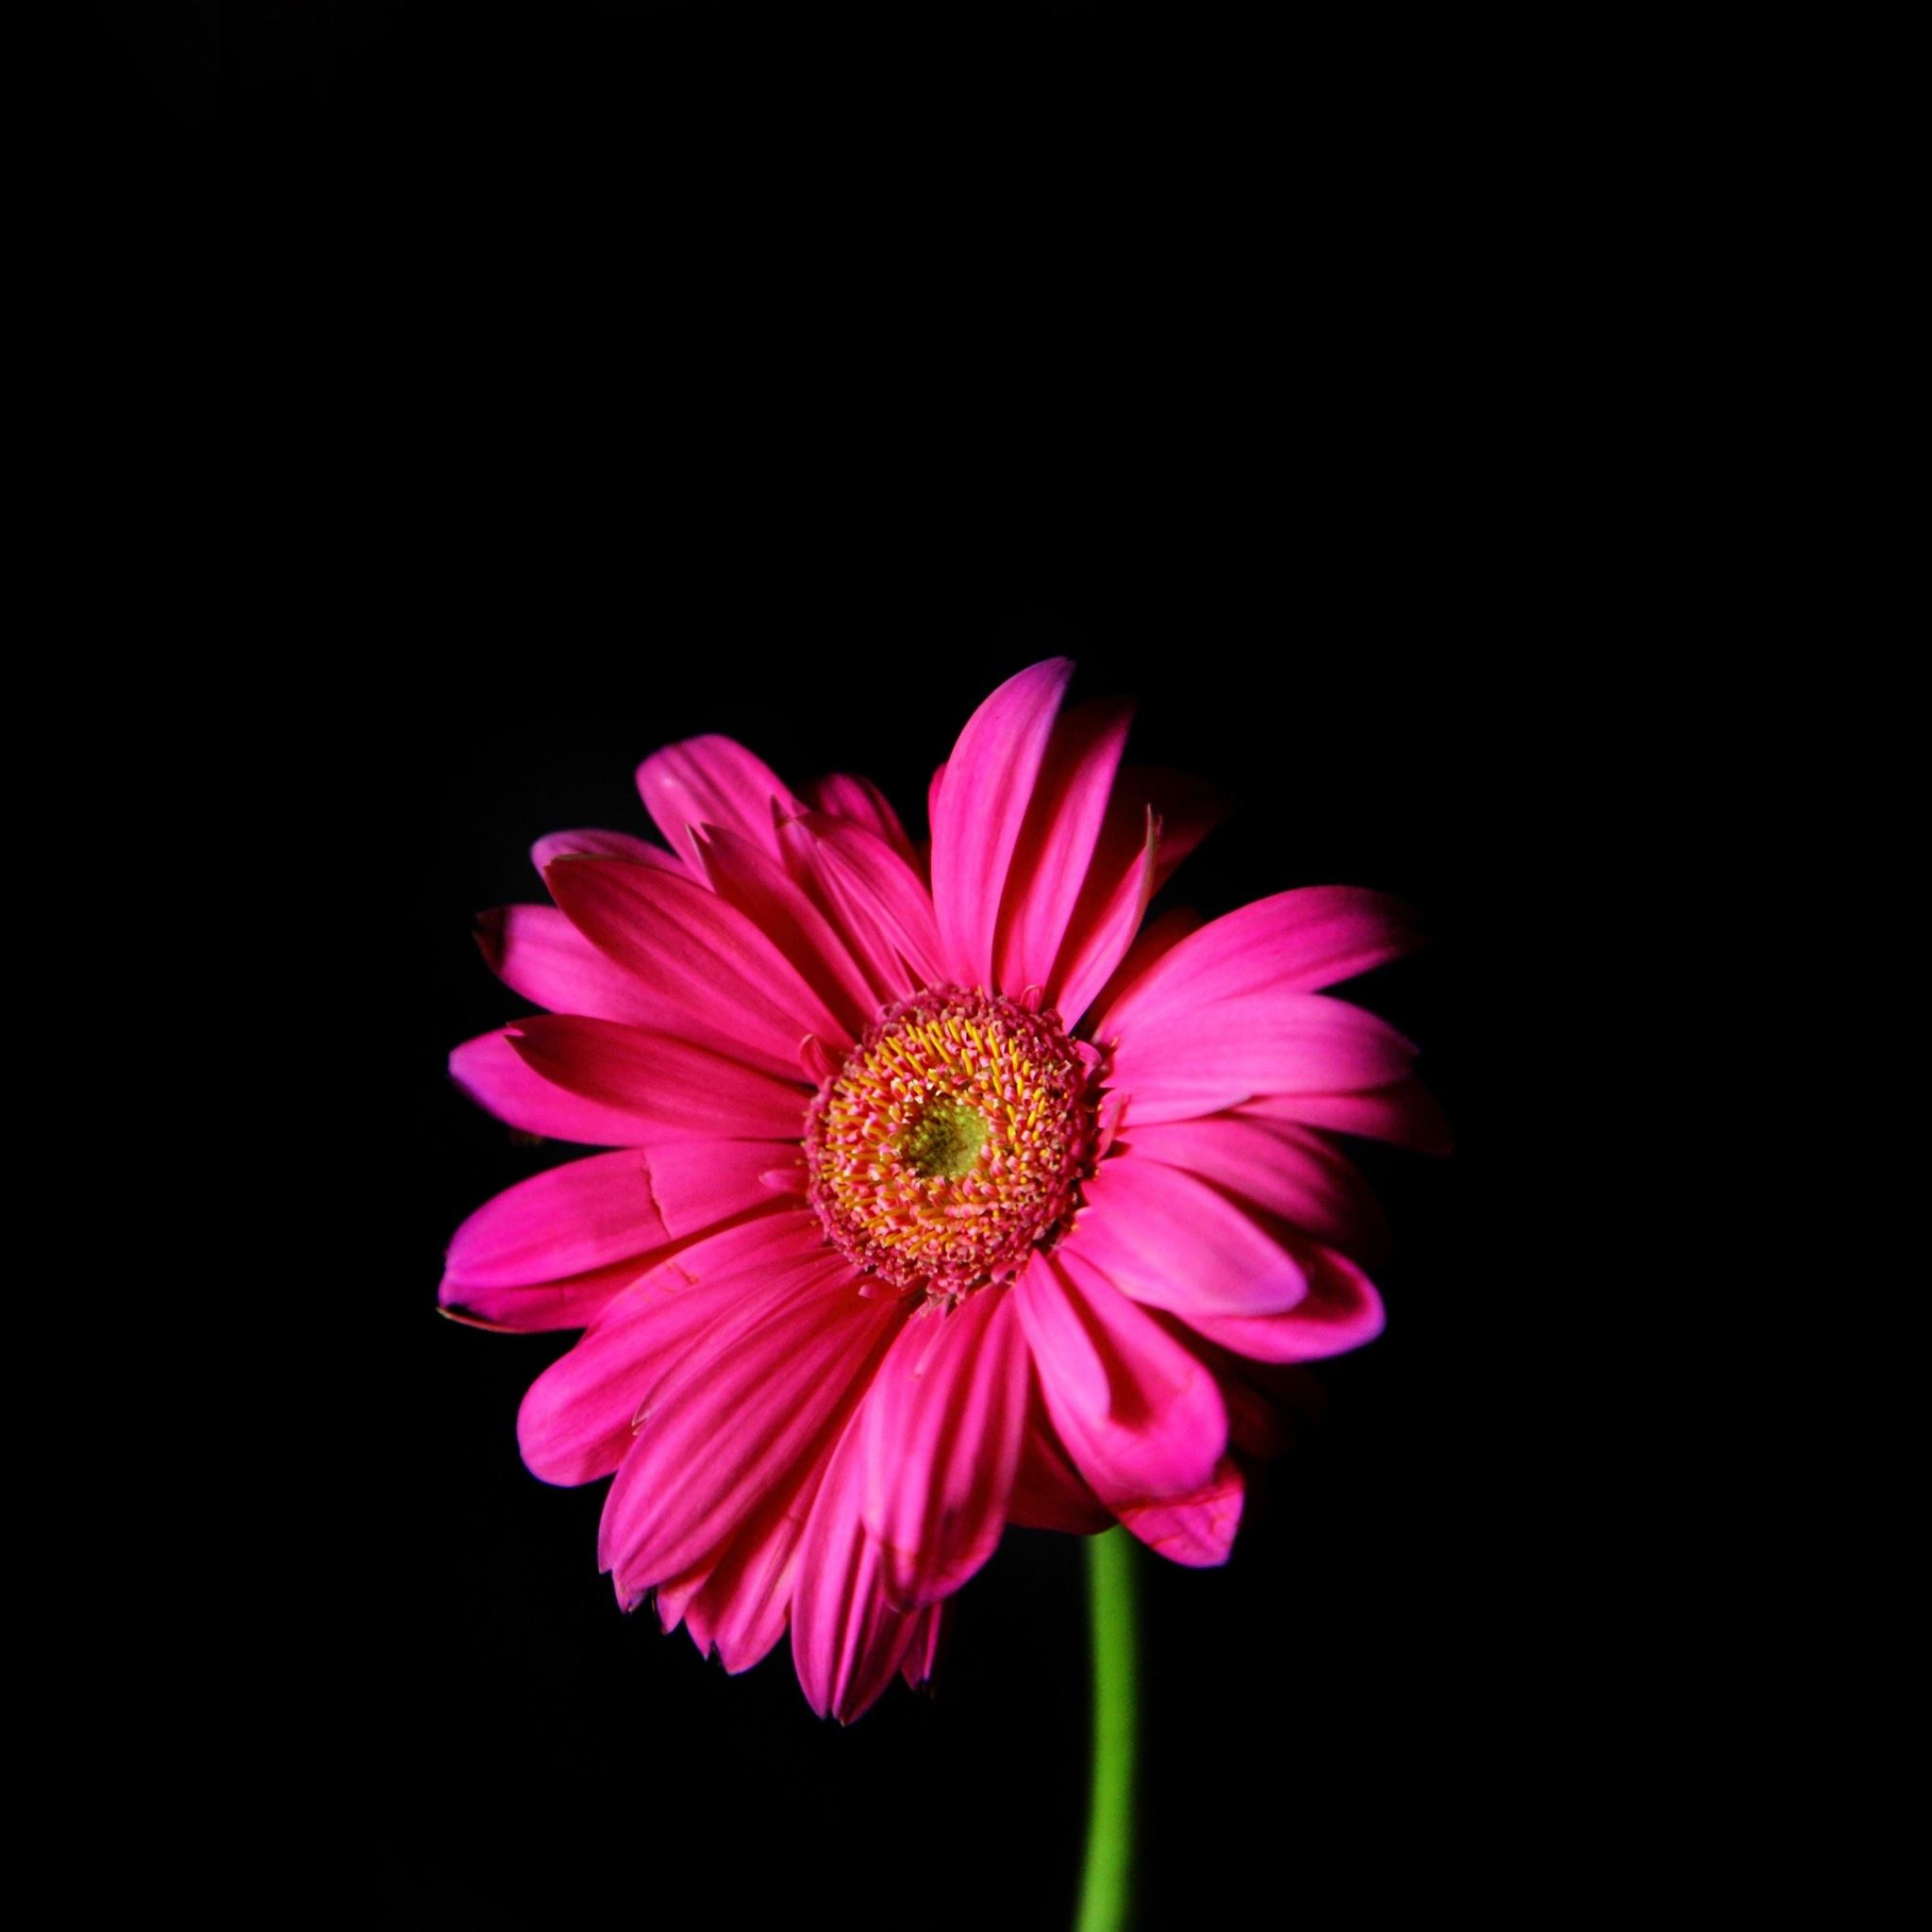 Flower in the dark macro ipad air wallpaper download iphone ipad air pin wallpaper mightylinksfo